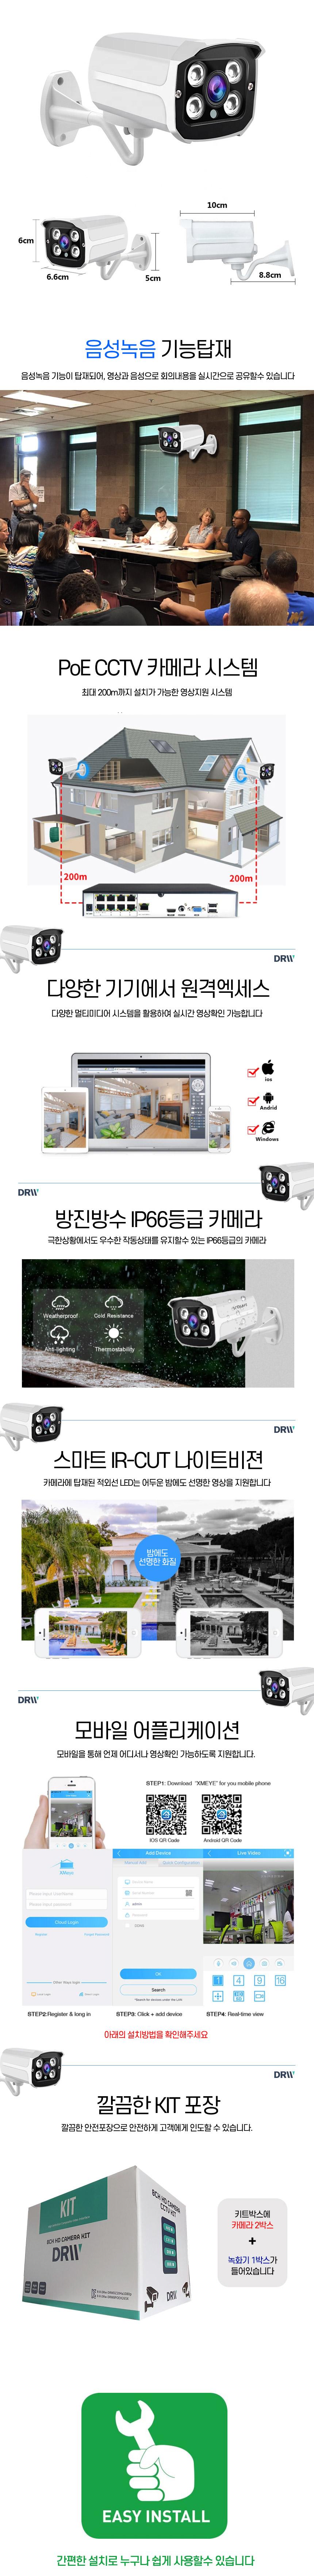 DRW DRW-8POE-H.265X + DRW-DZ20-Ha-1080P (녹화기 + 카메라 8개)